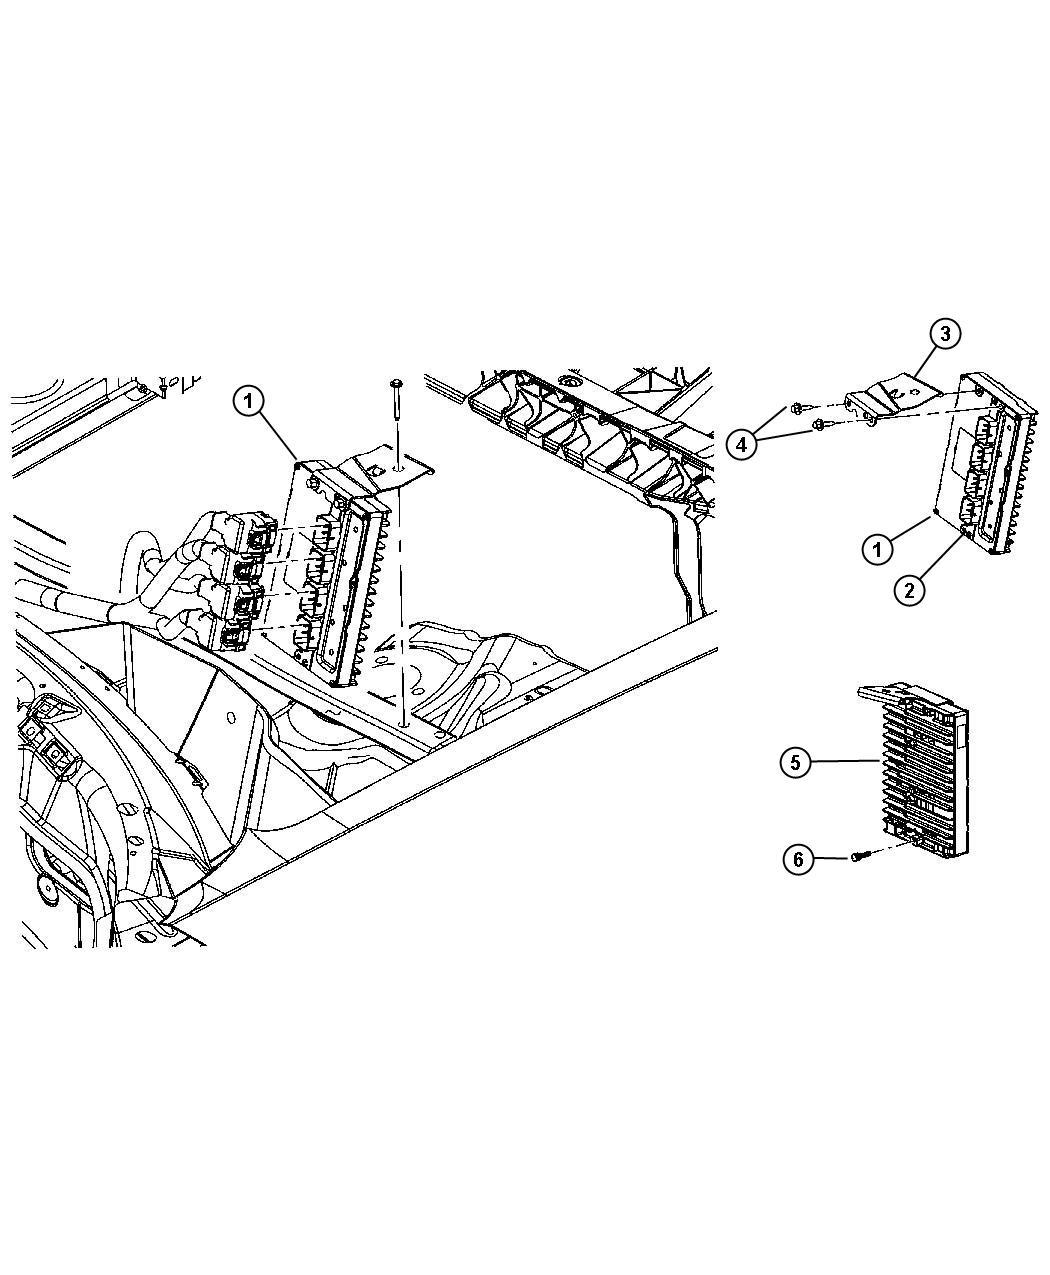 Dodge Challenger Module. Powertrain control. Generic